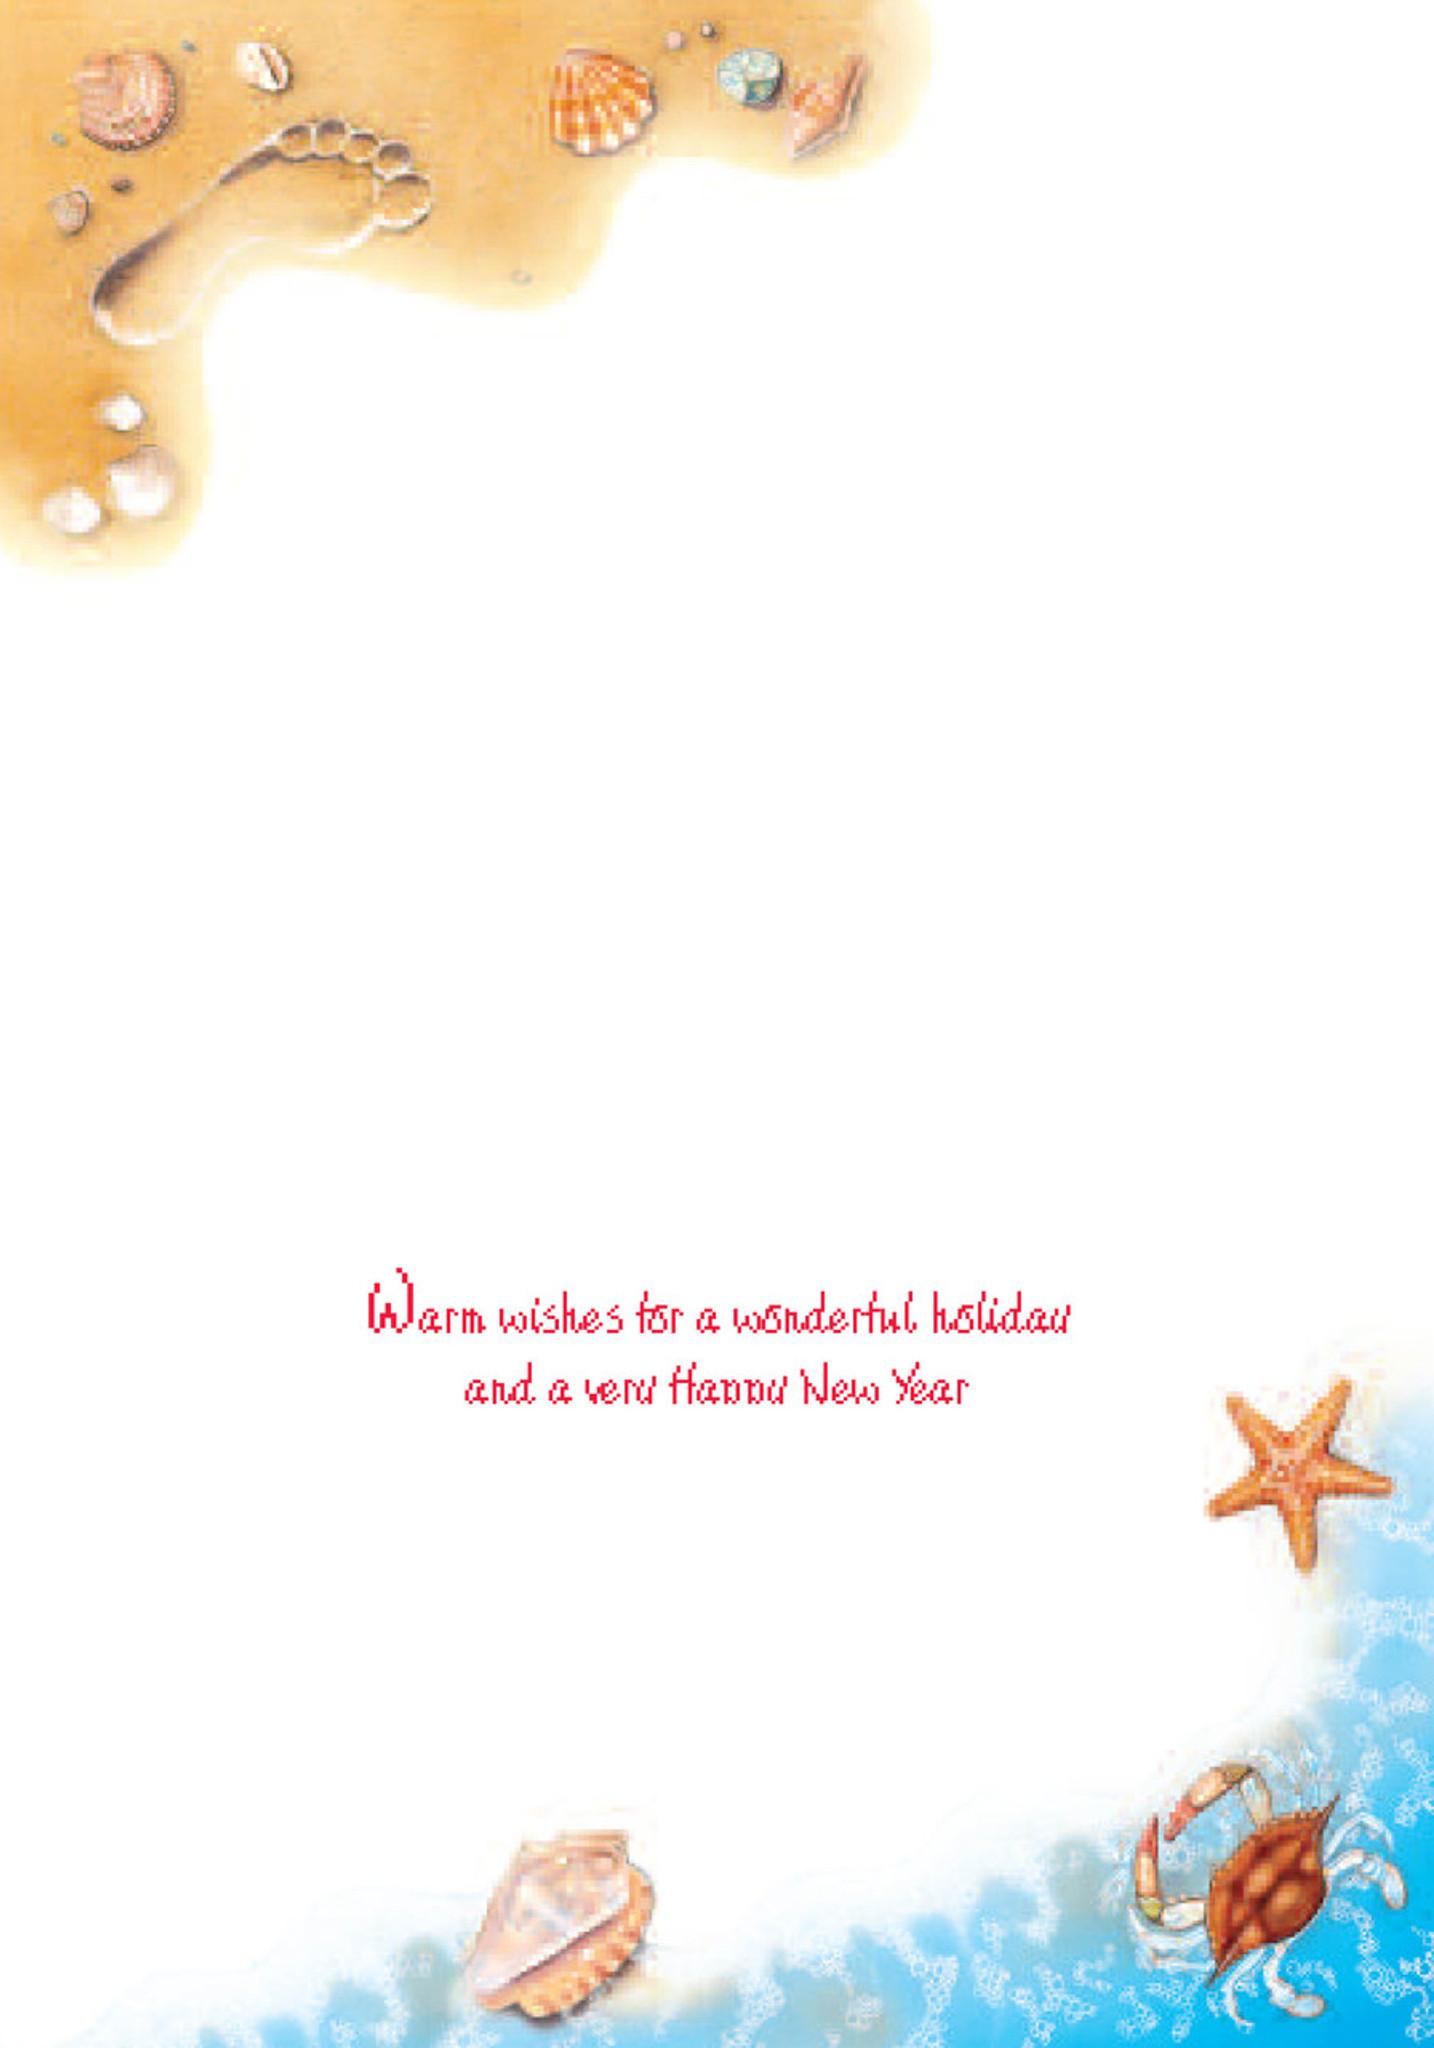 Seasons Greetings Surf Holiday Cards Coastal Christmas Stationery